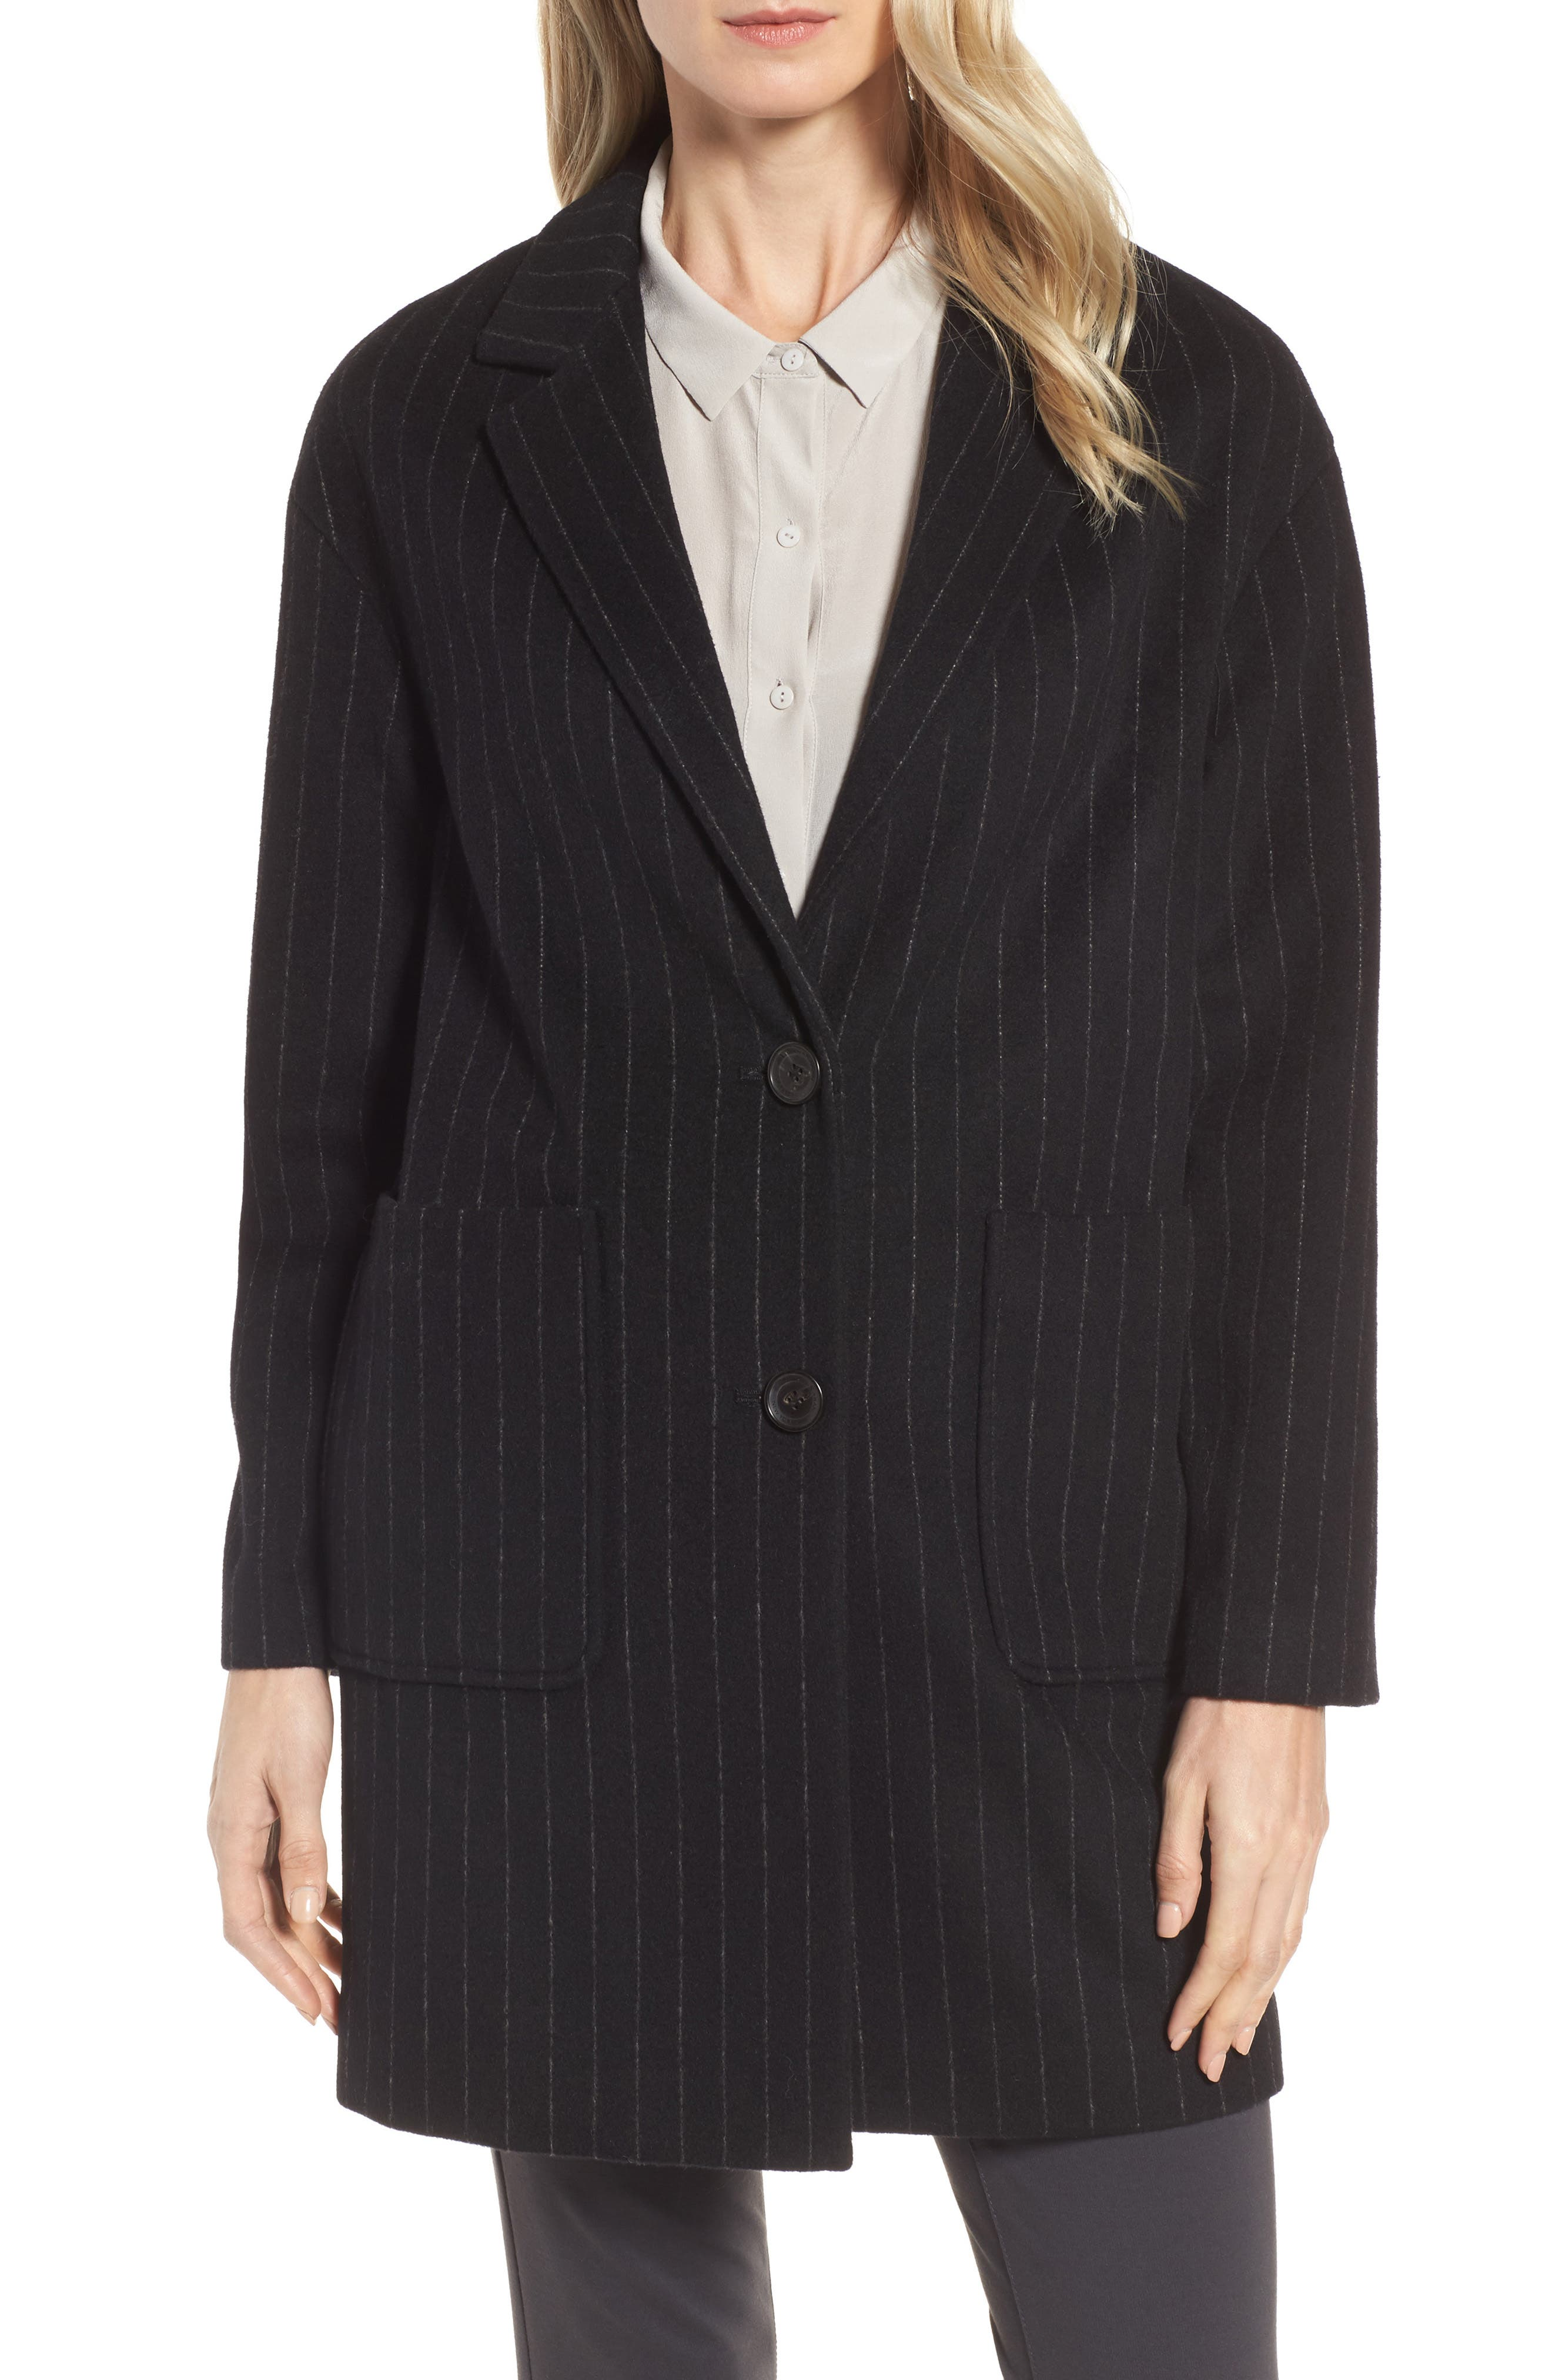 DKNY Pinstripe Wool Blend Coat,                             Main thumbnail 1, color,                             001